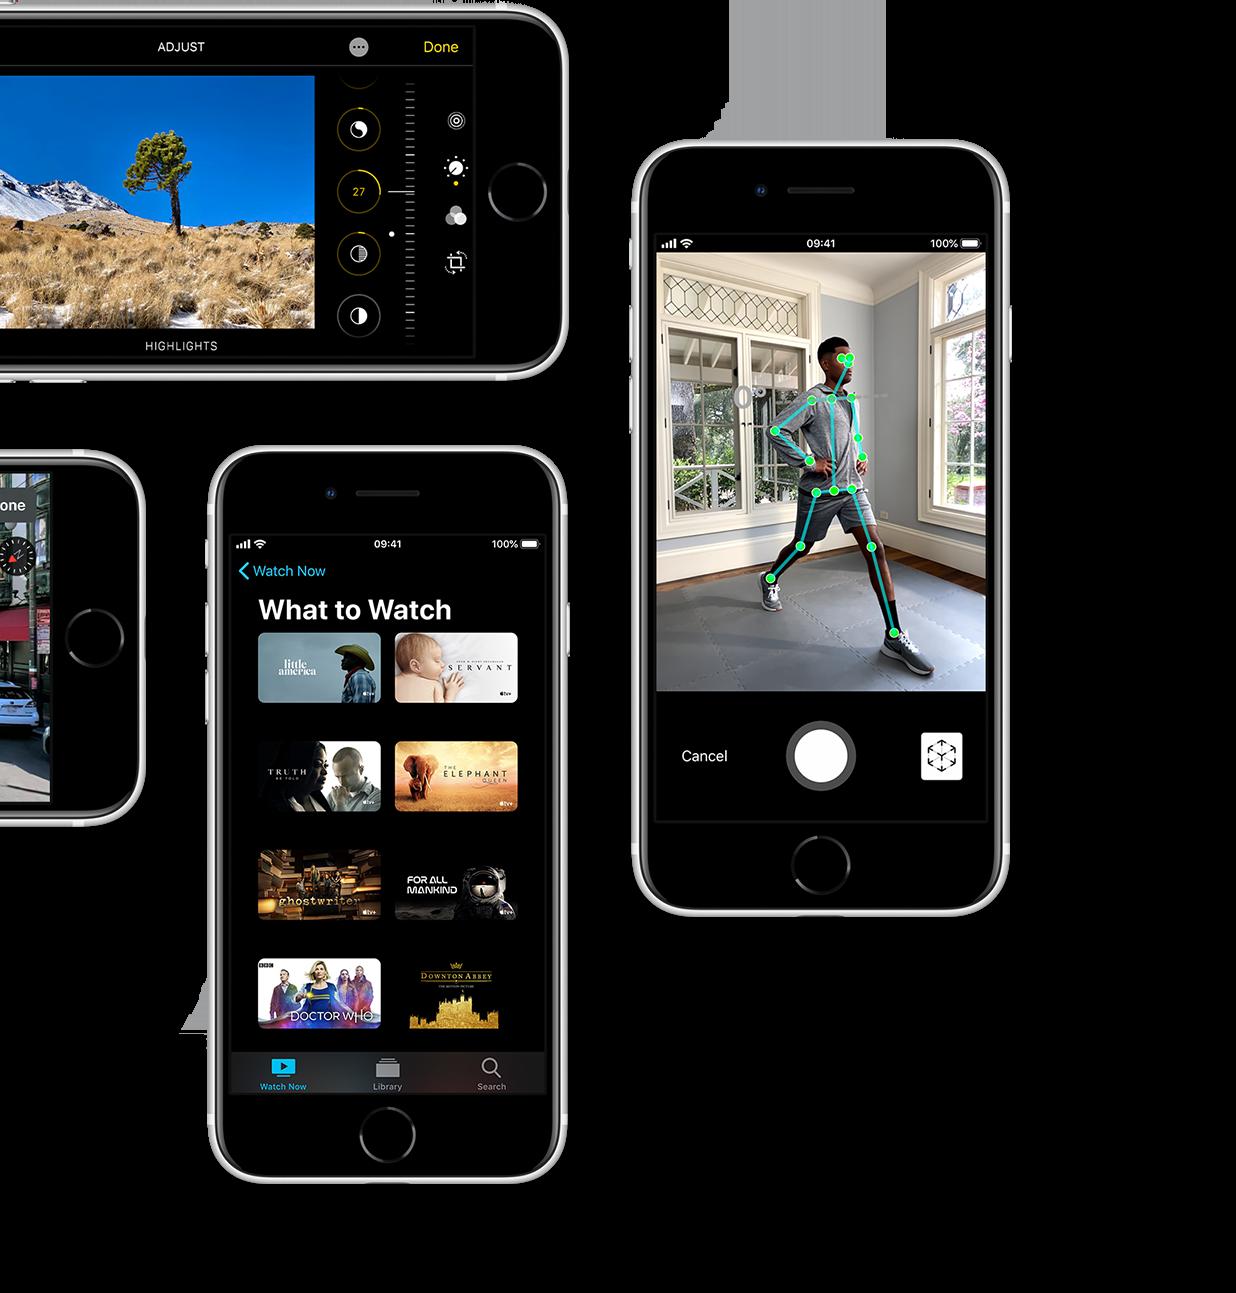 iPhone SE 2020 performance